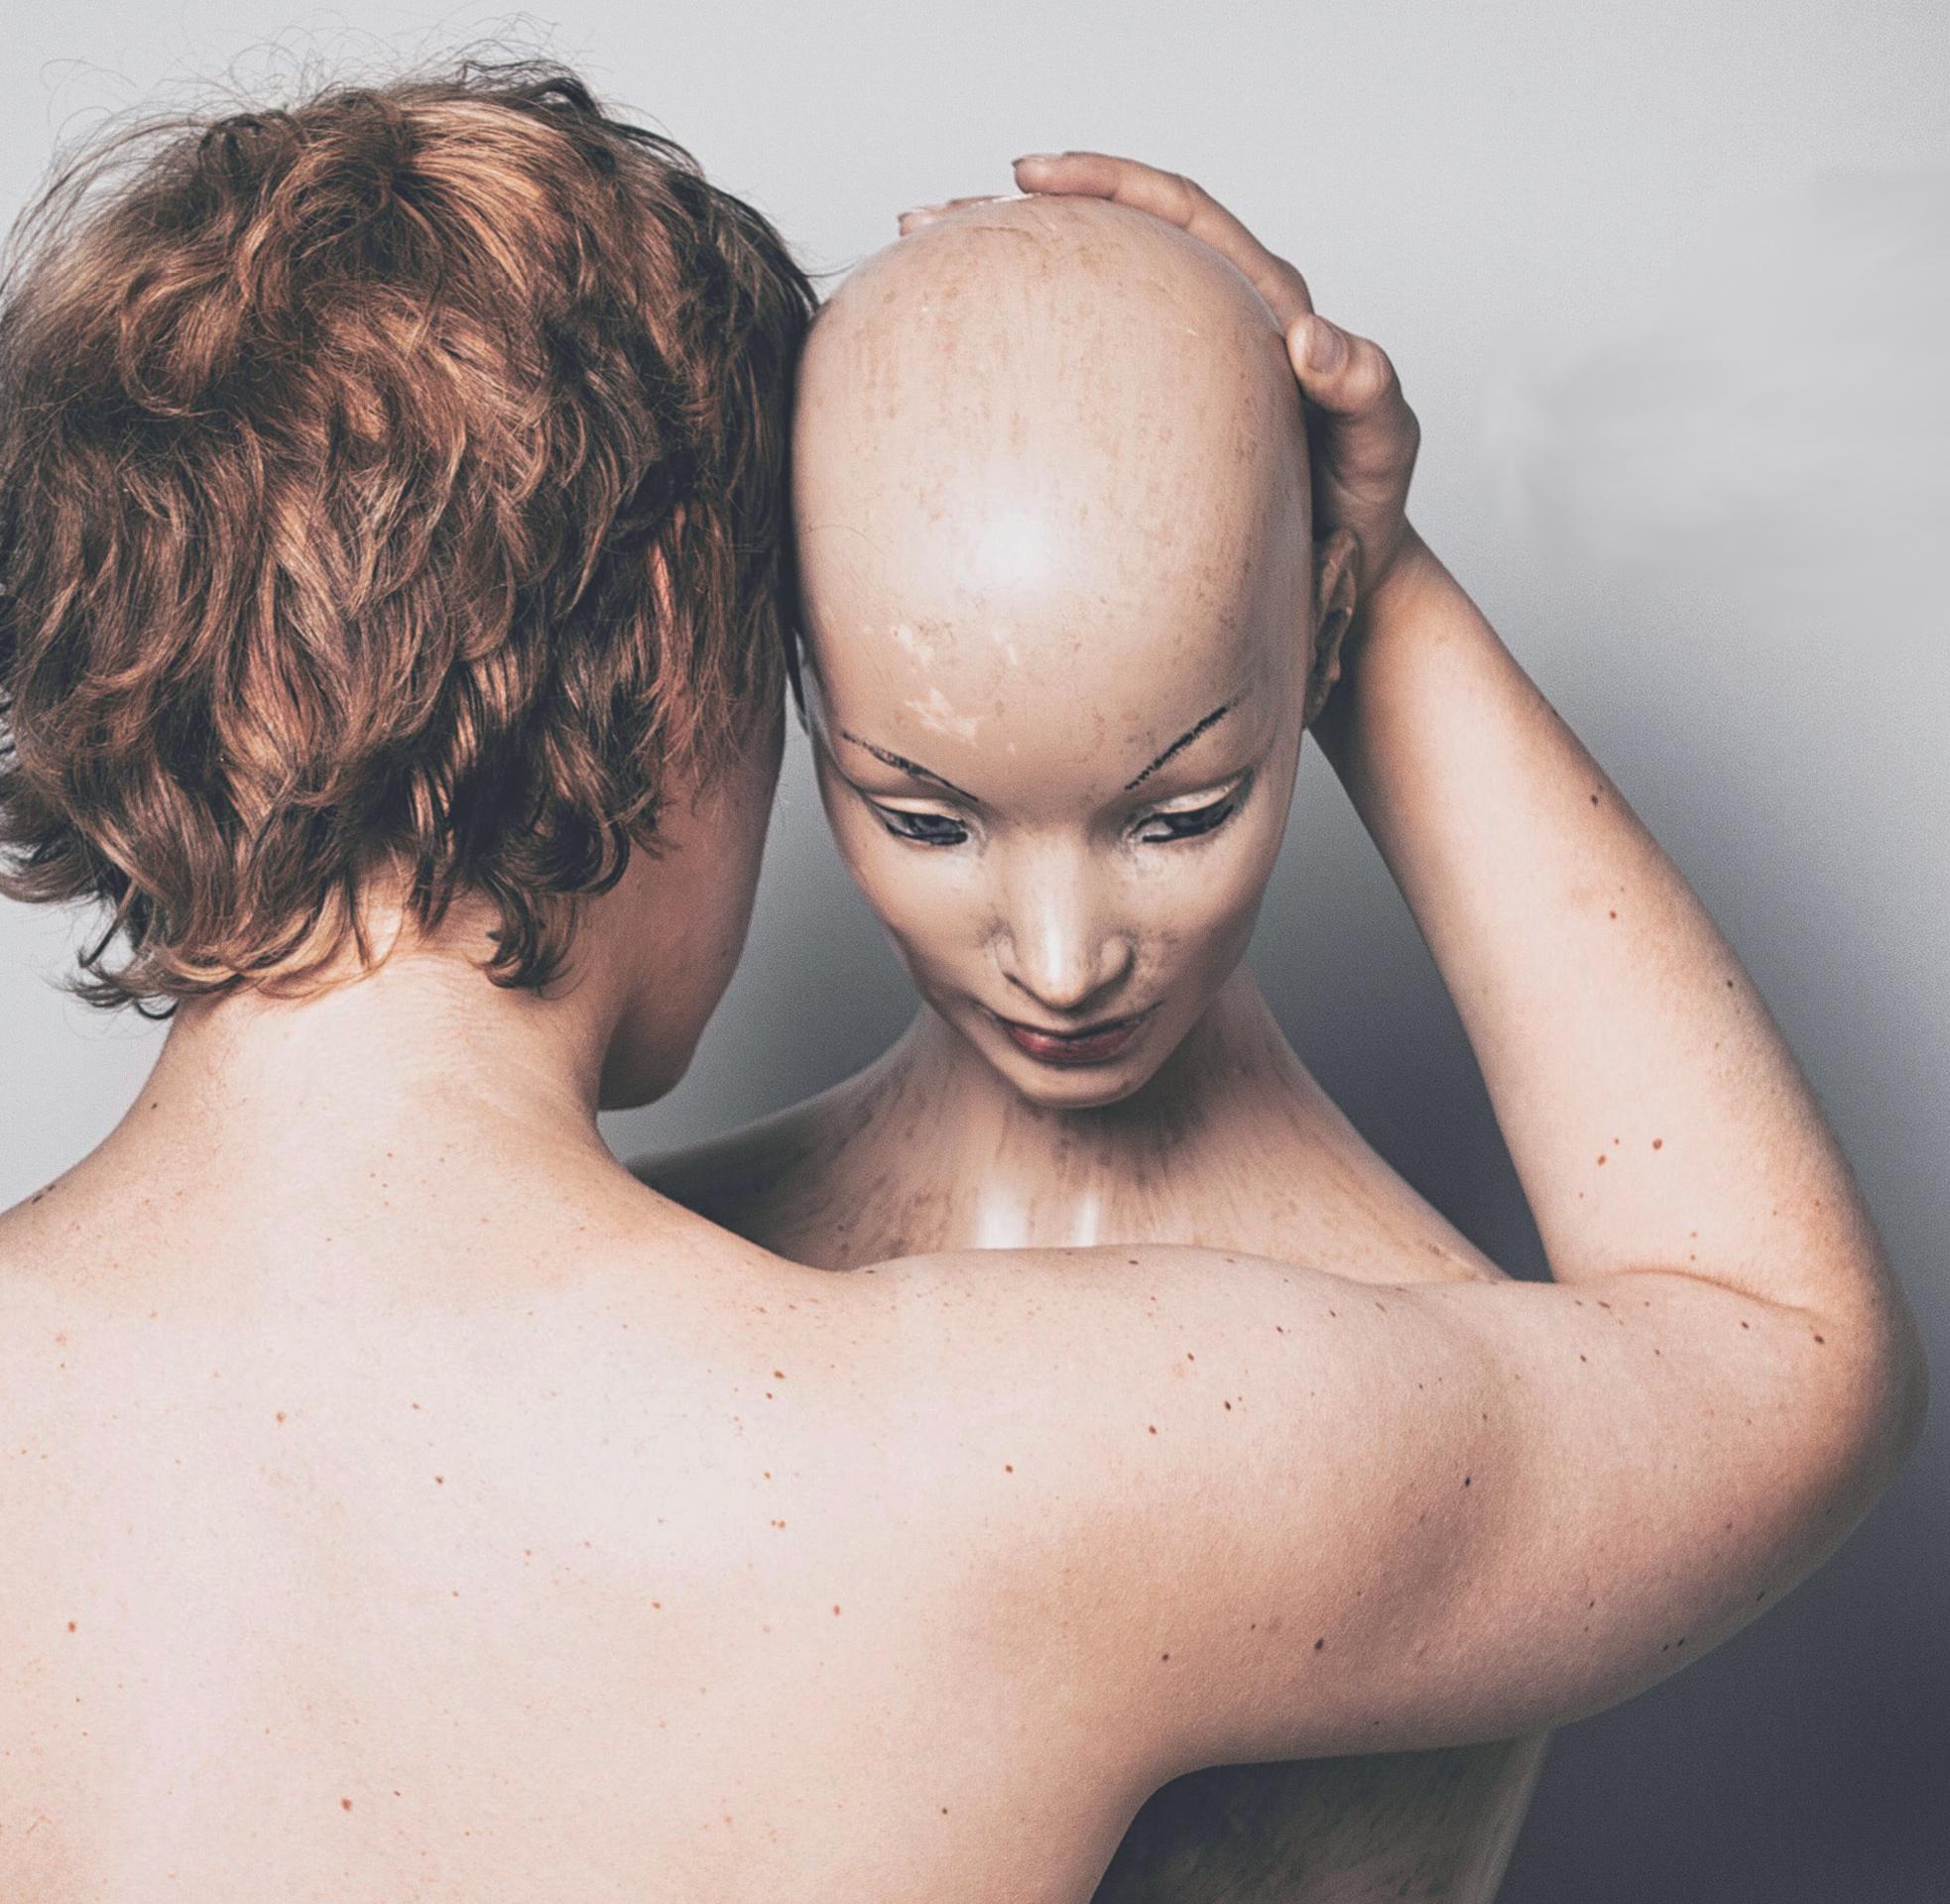 Sexroboter männlich